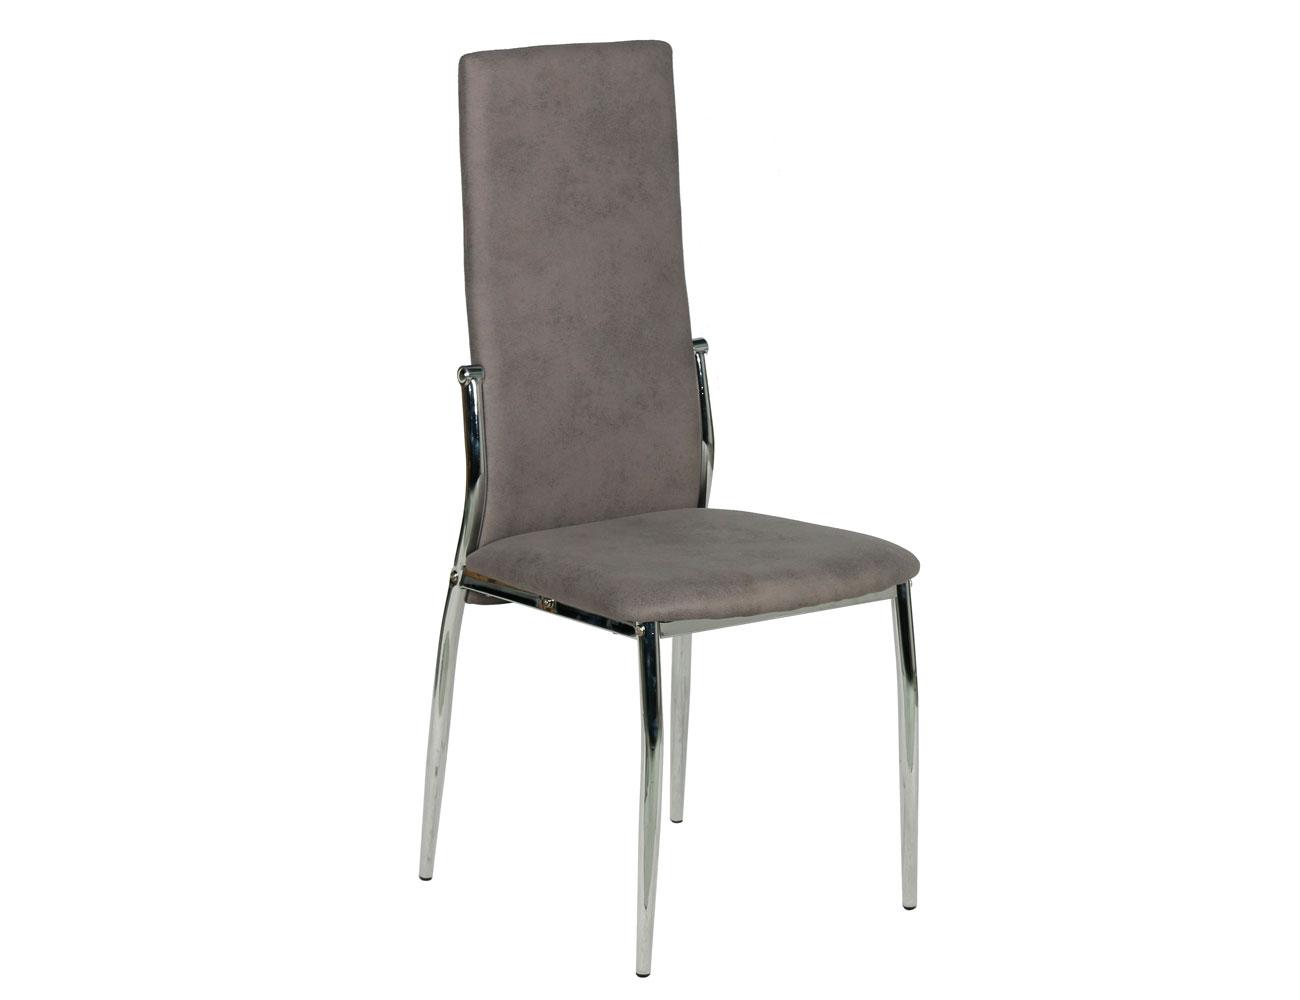 Tapizar sillas con respaldo latest silla fija con for Sillas comedor respaldo bajo